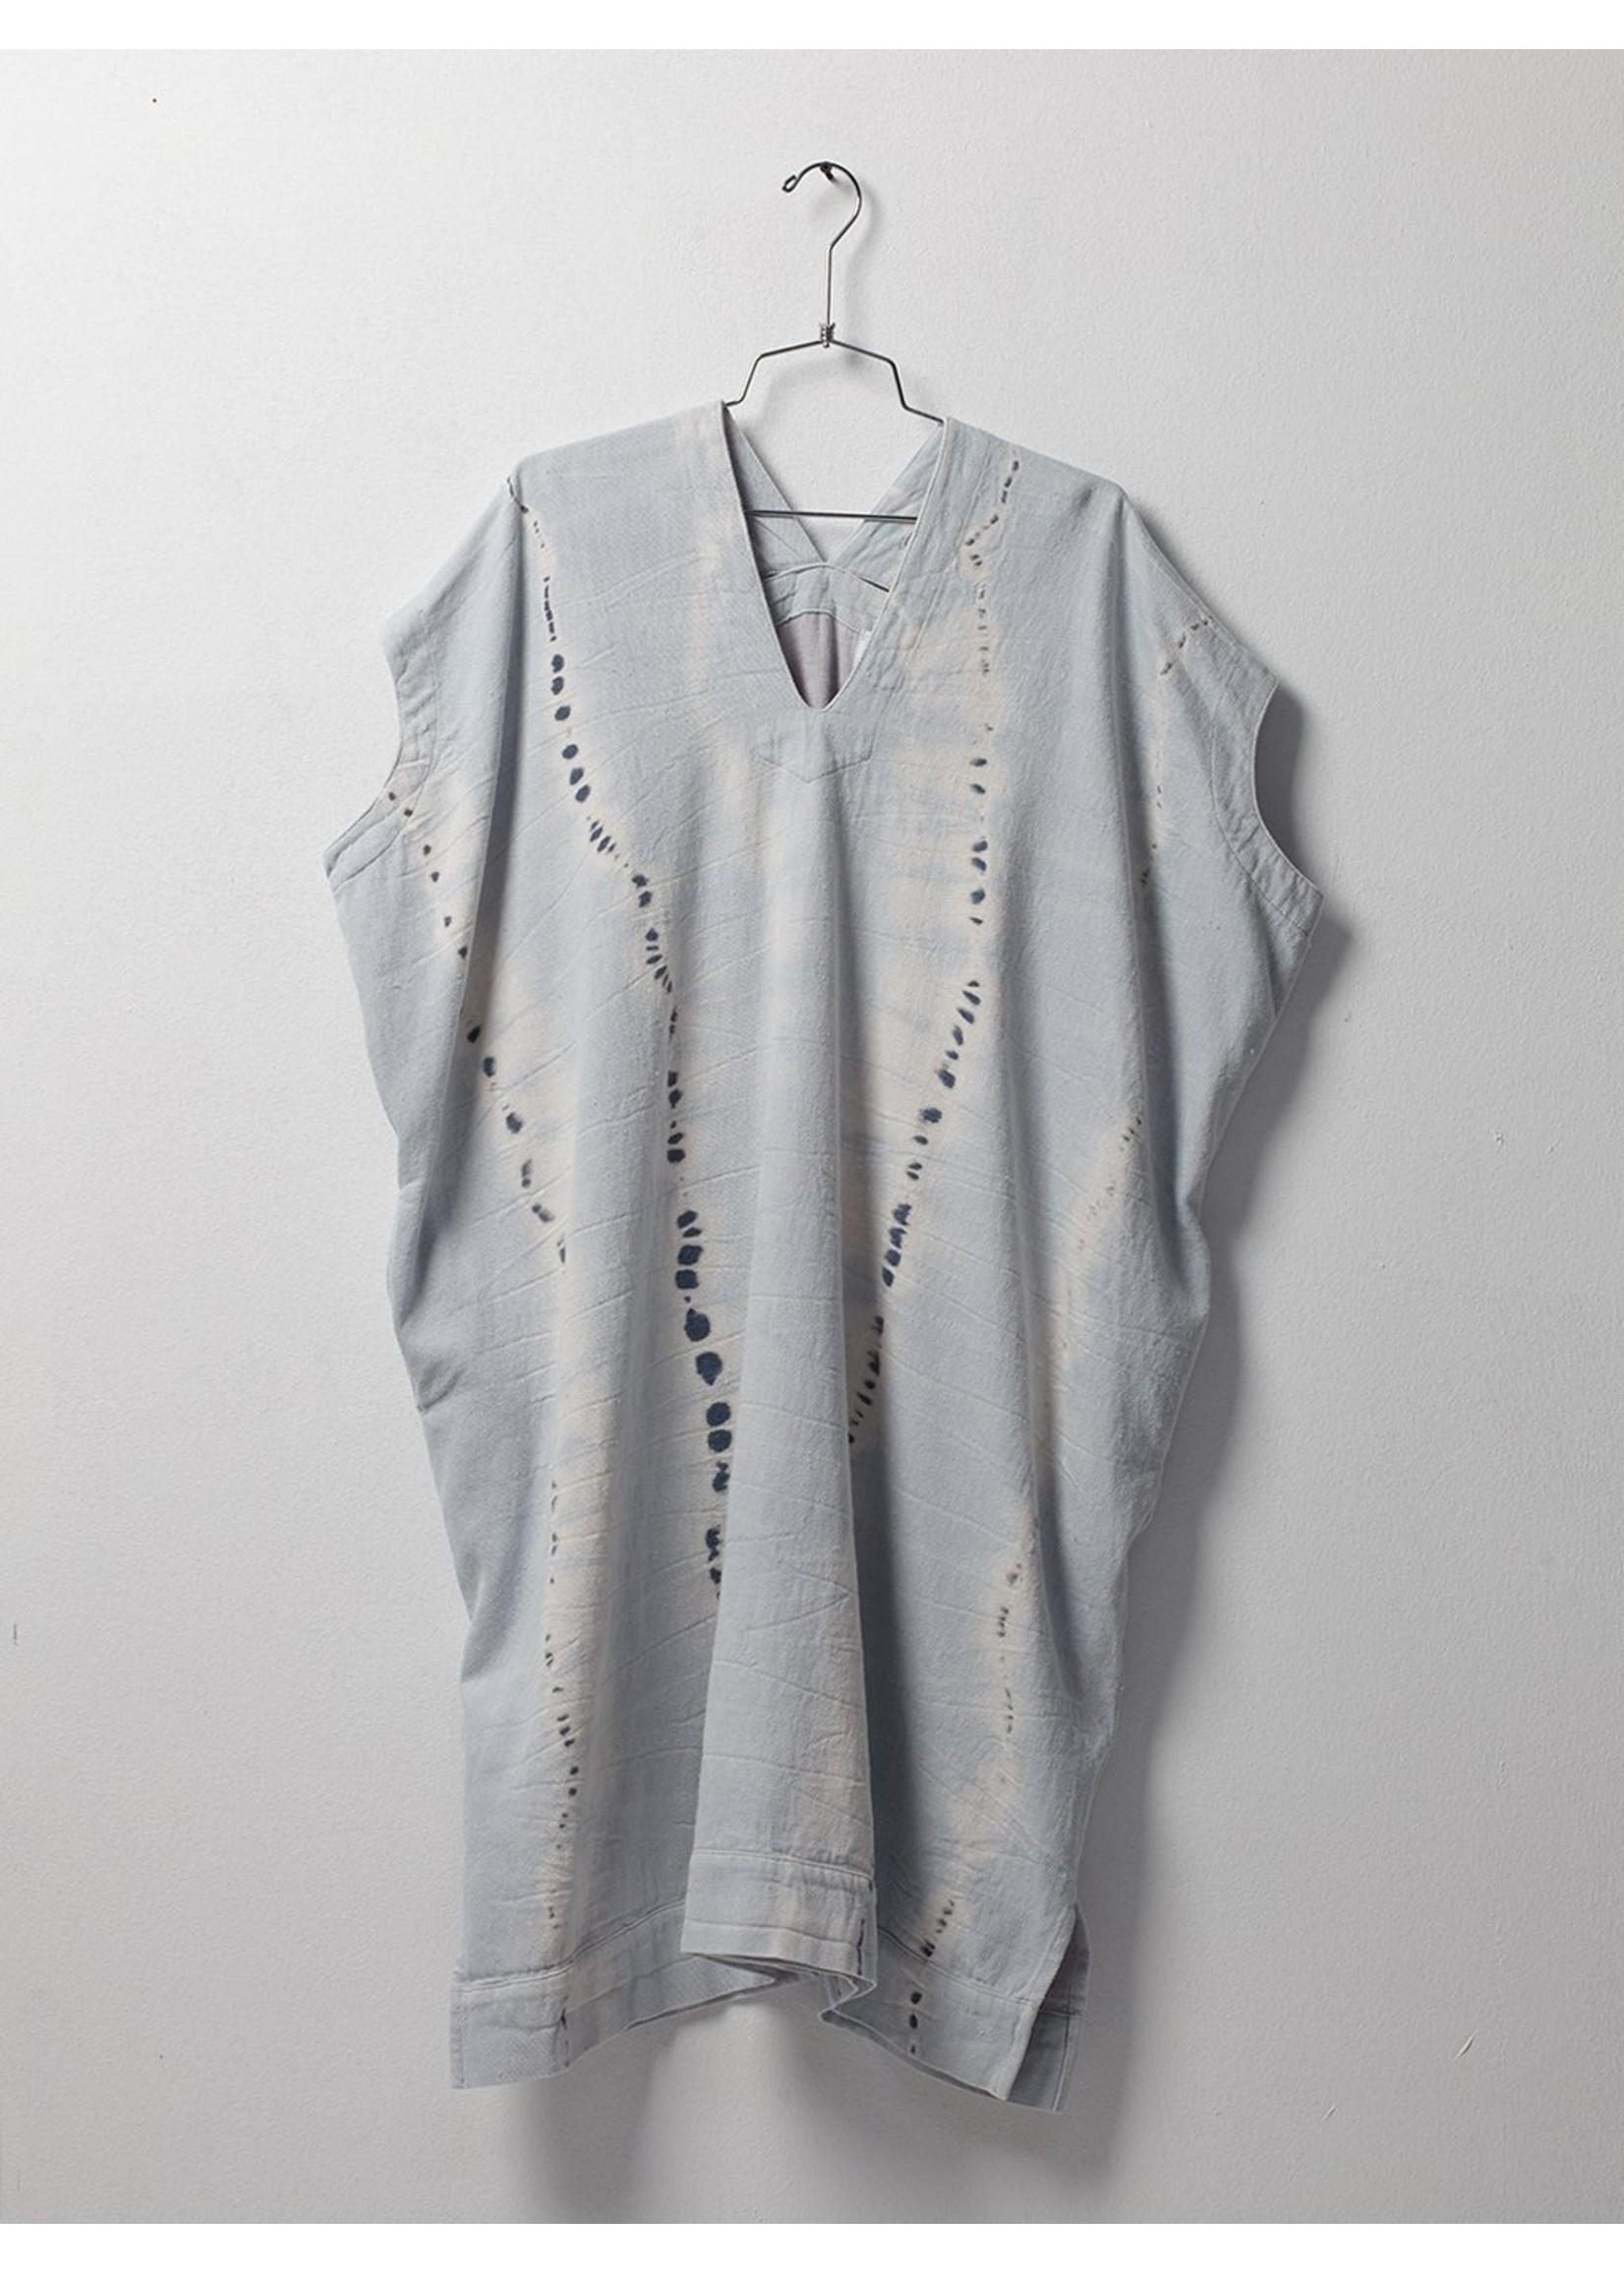 Atelier Delphine Atelier Delphine Ice Wash Crescent Dress